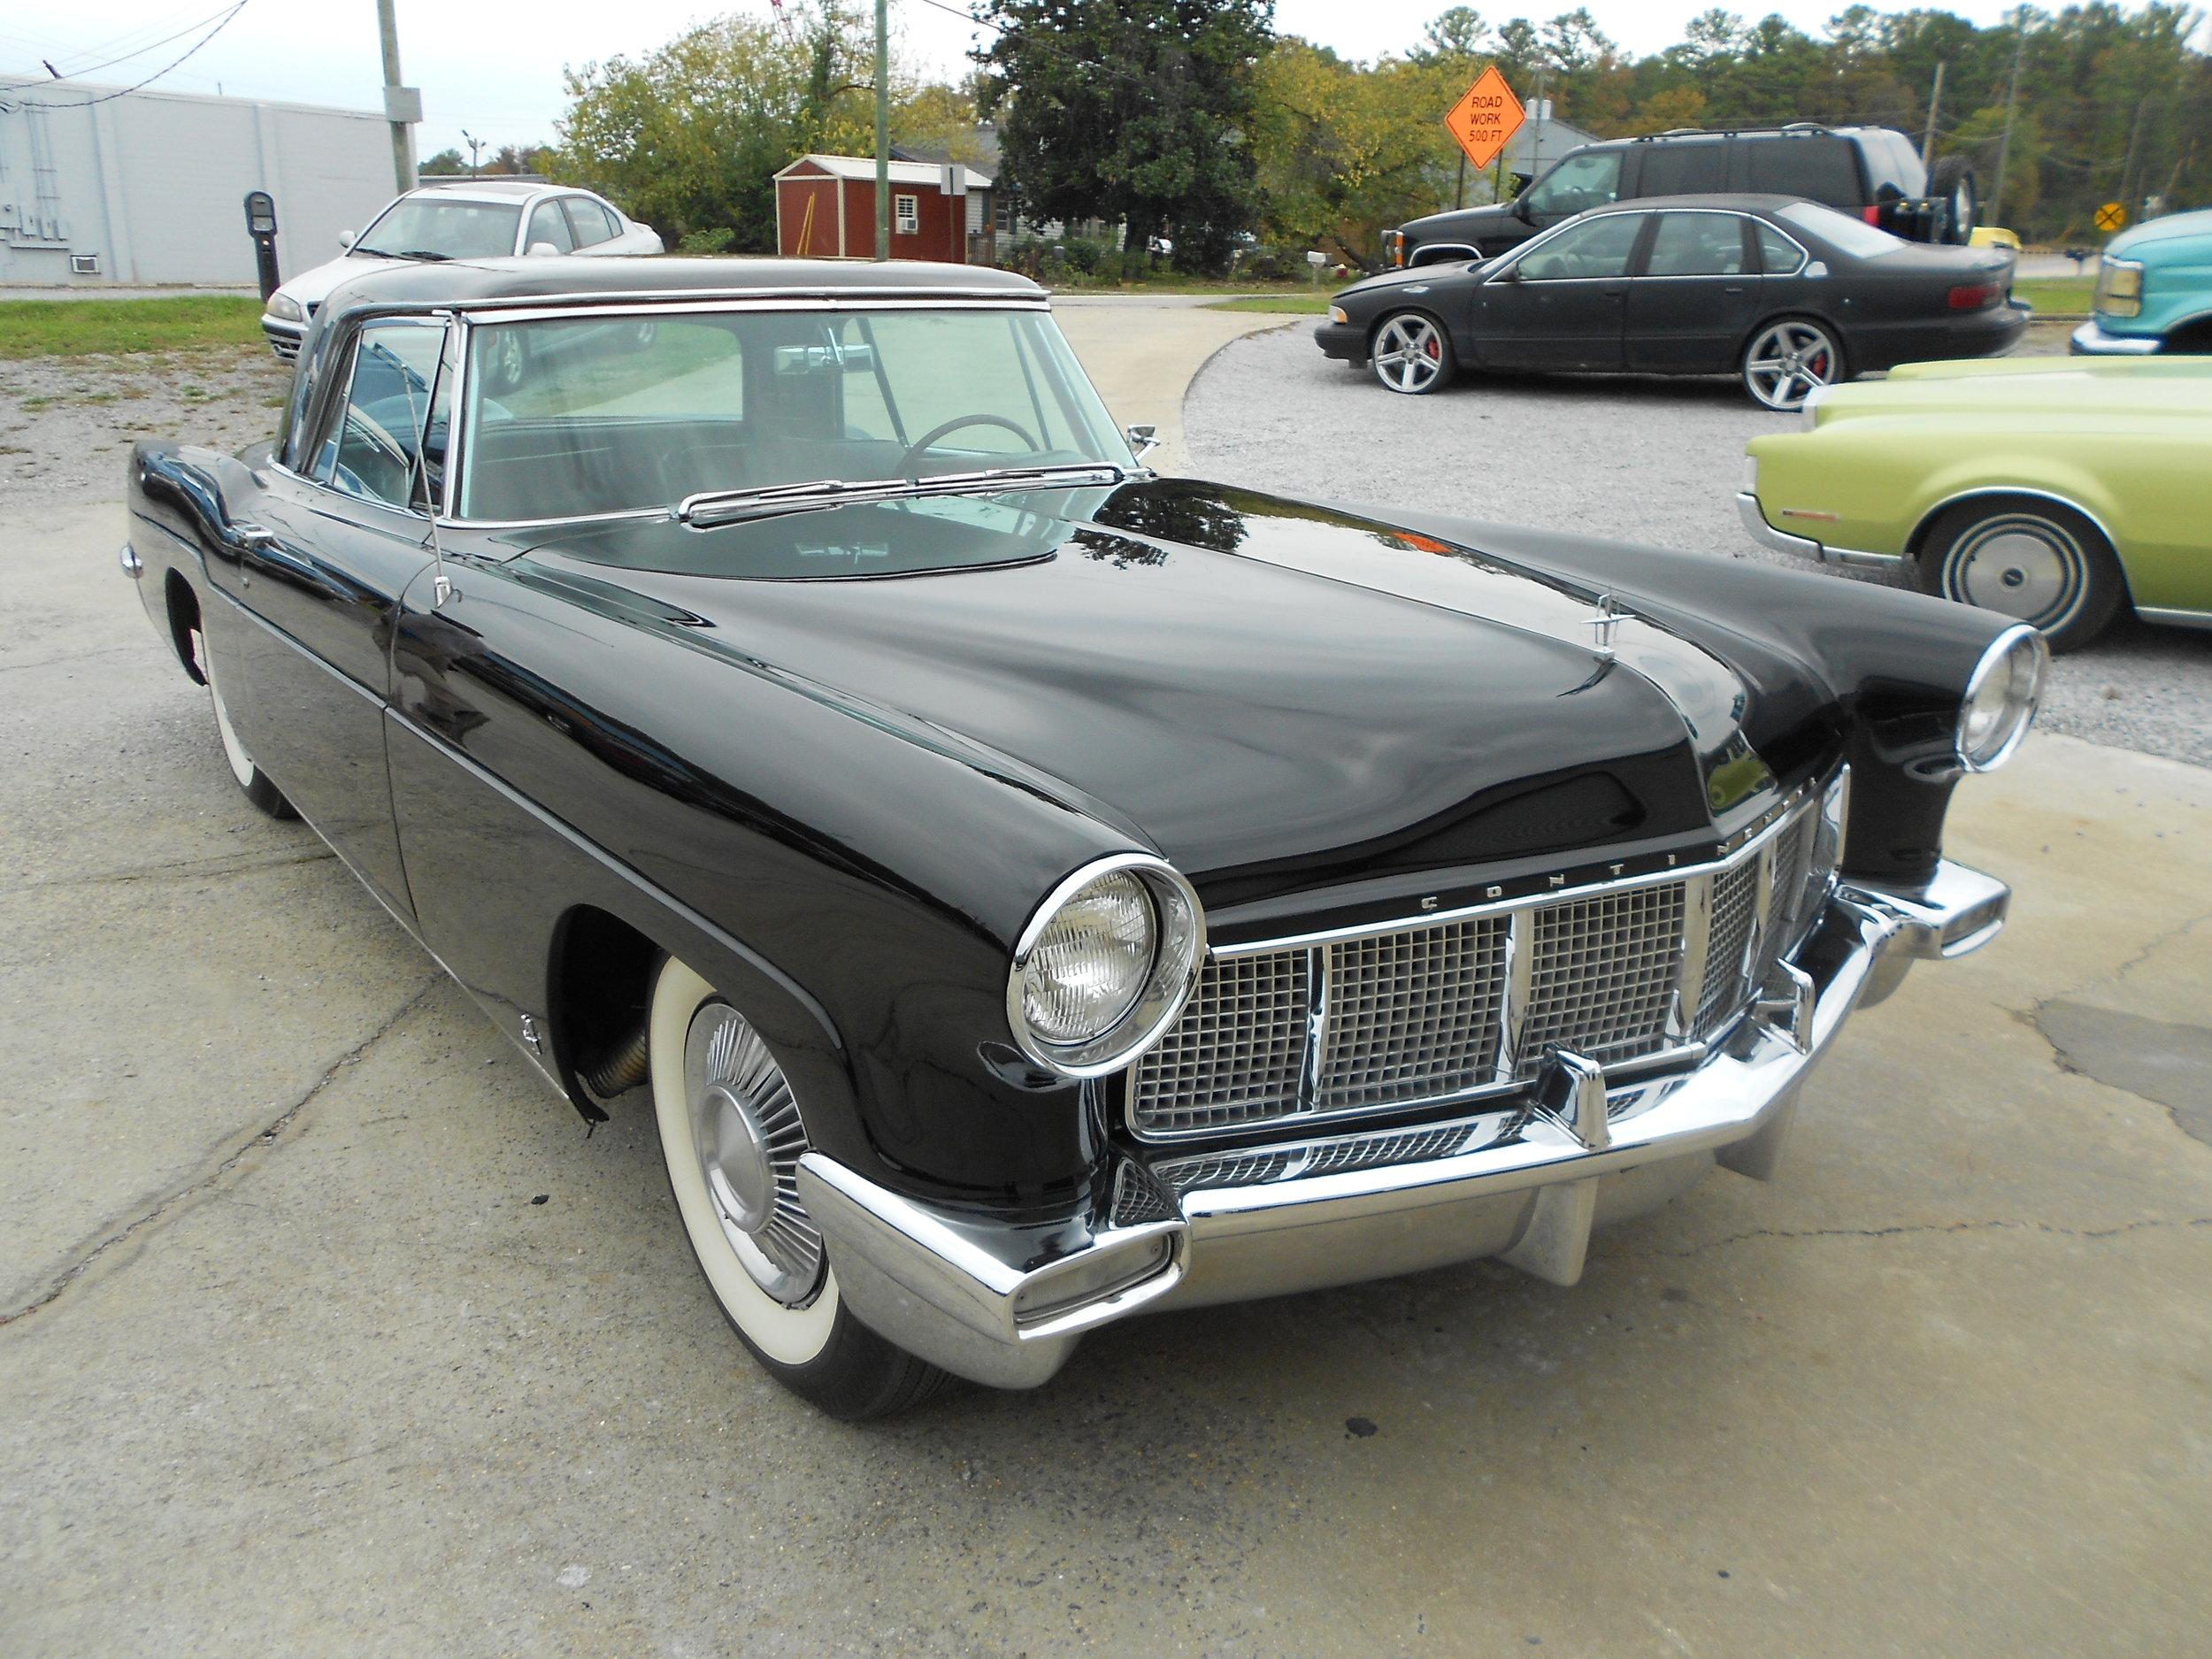 1957 mark II Lincoln -